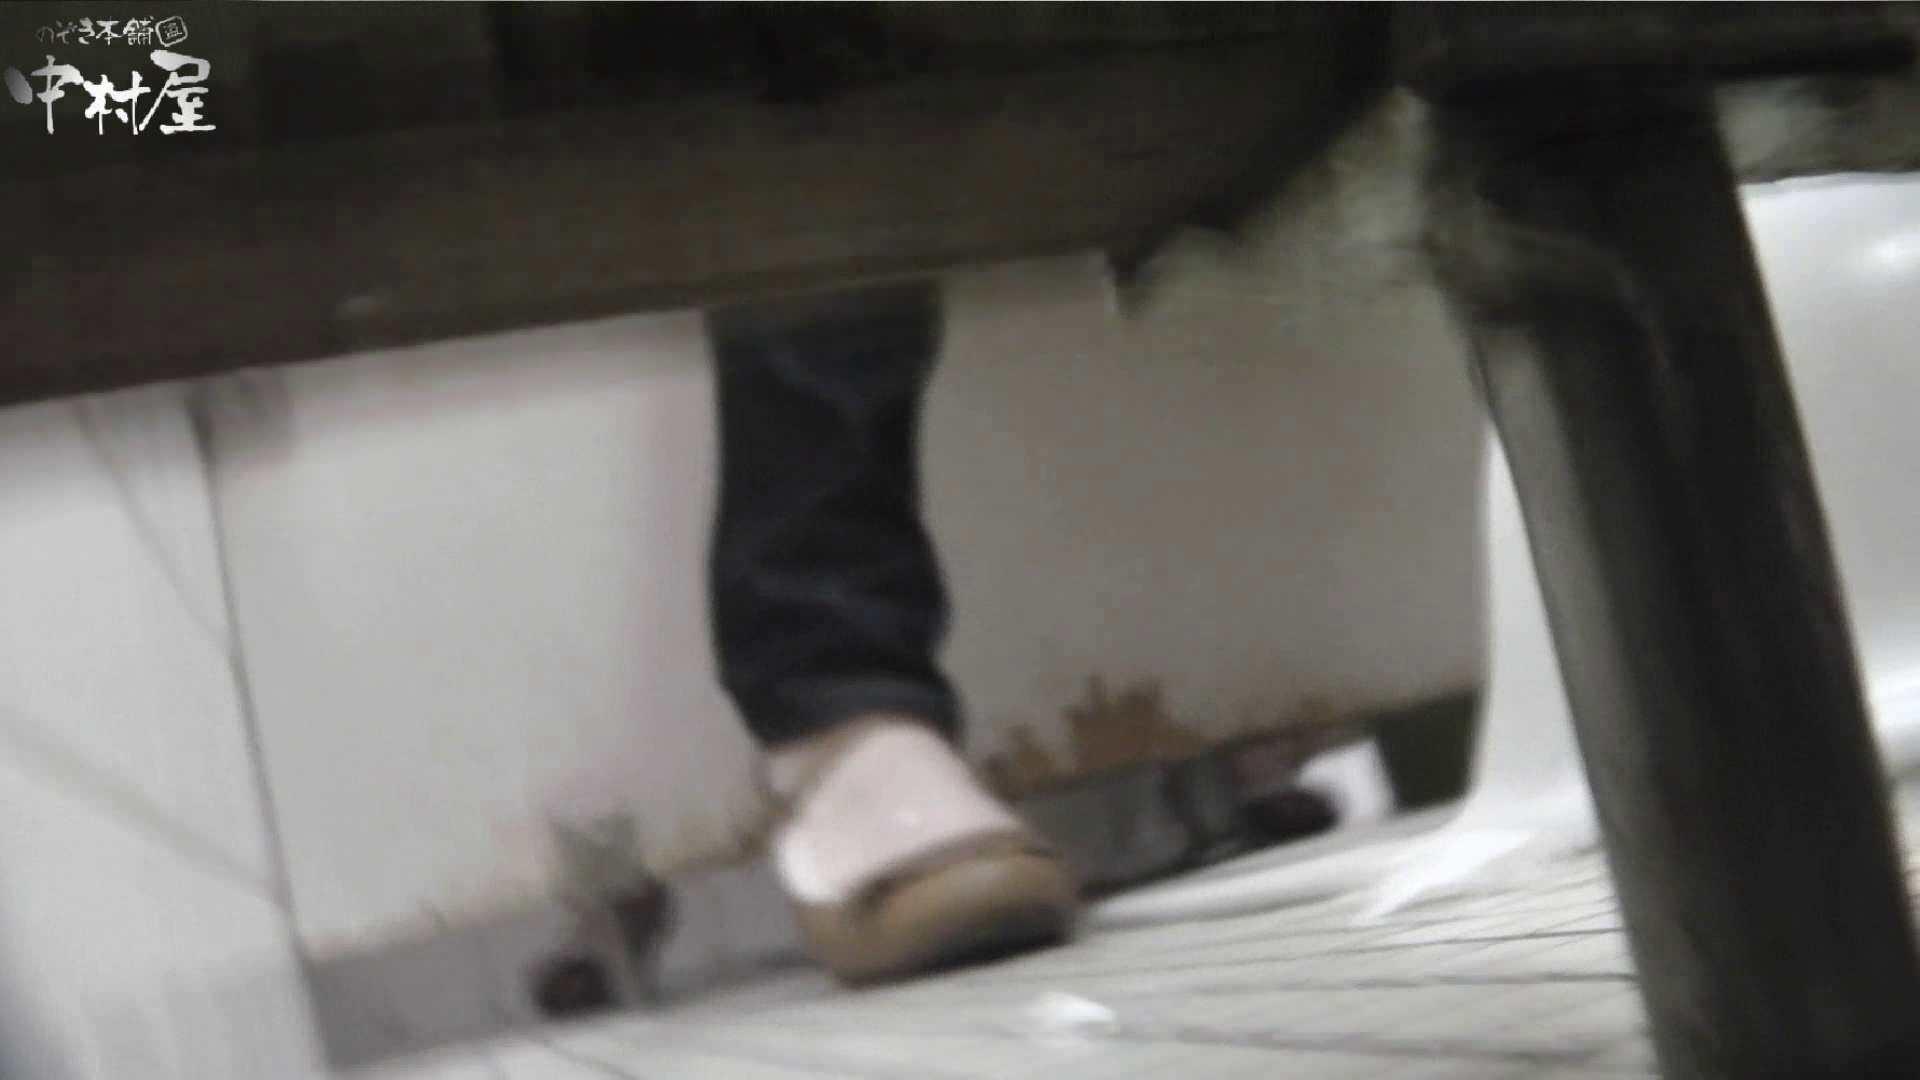 vol.52 命がけ潜伏洗面所! ピアノが上手そうなおねぃさんは剛毛な件 洗面所   潜入画像  67画像 16